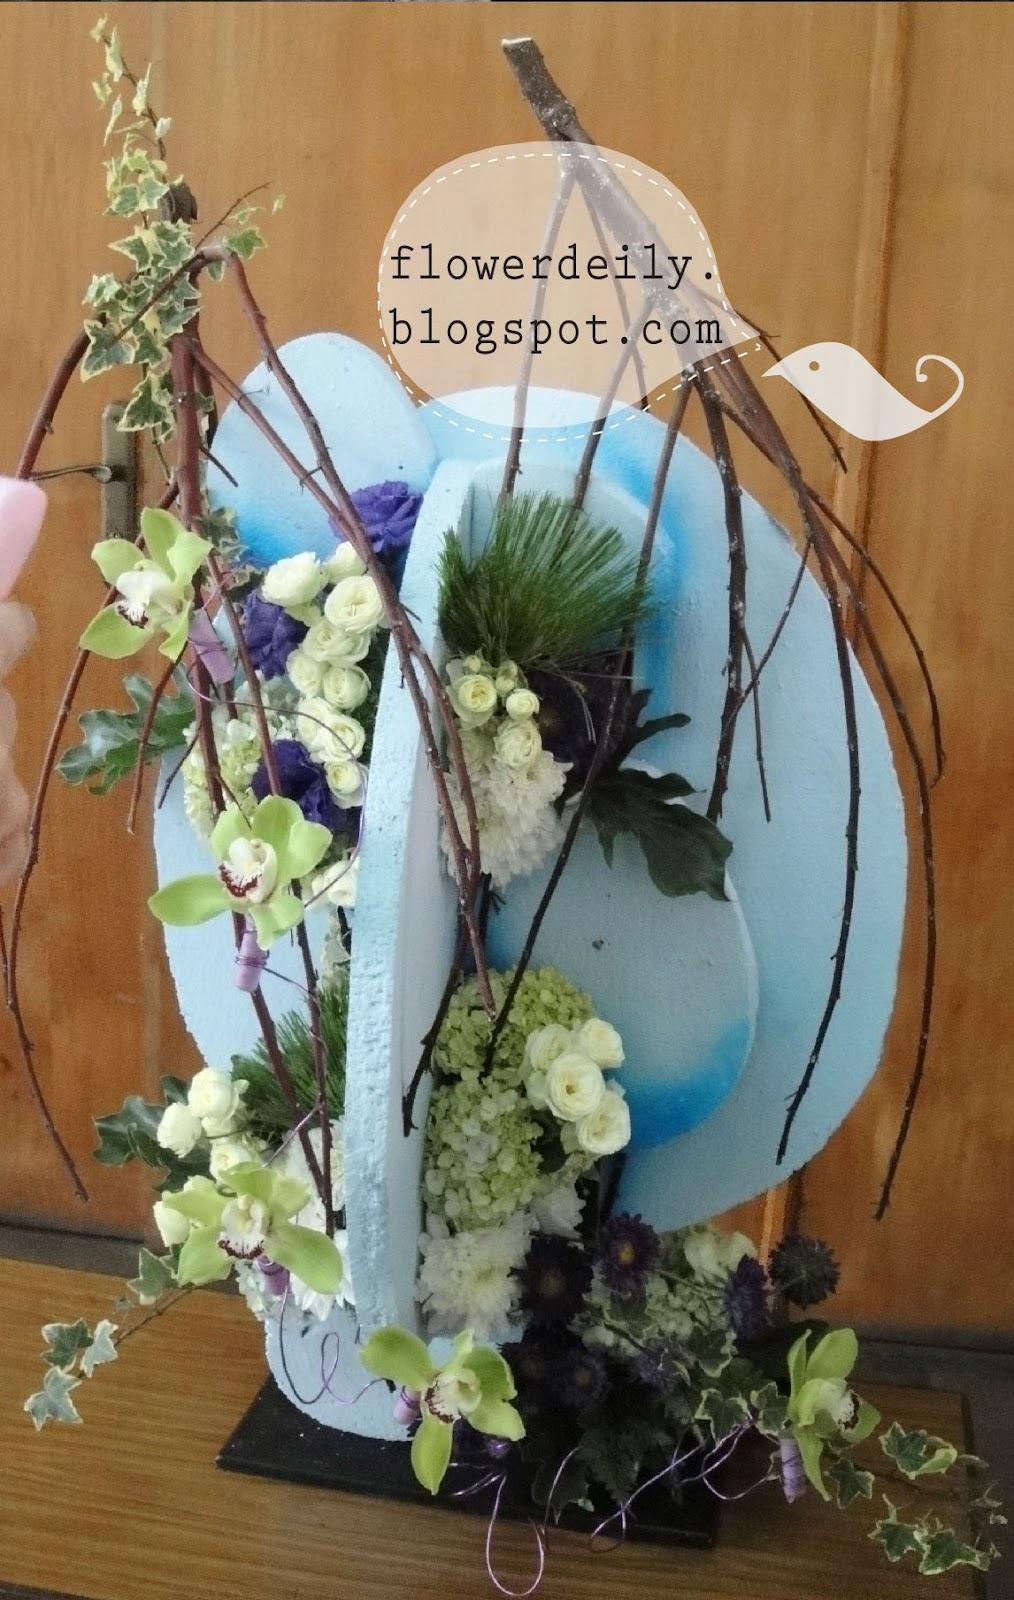 17 Best images about Spring/Summer Floral Arrangements on ... |Large Spring Floral Arrangements